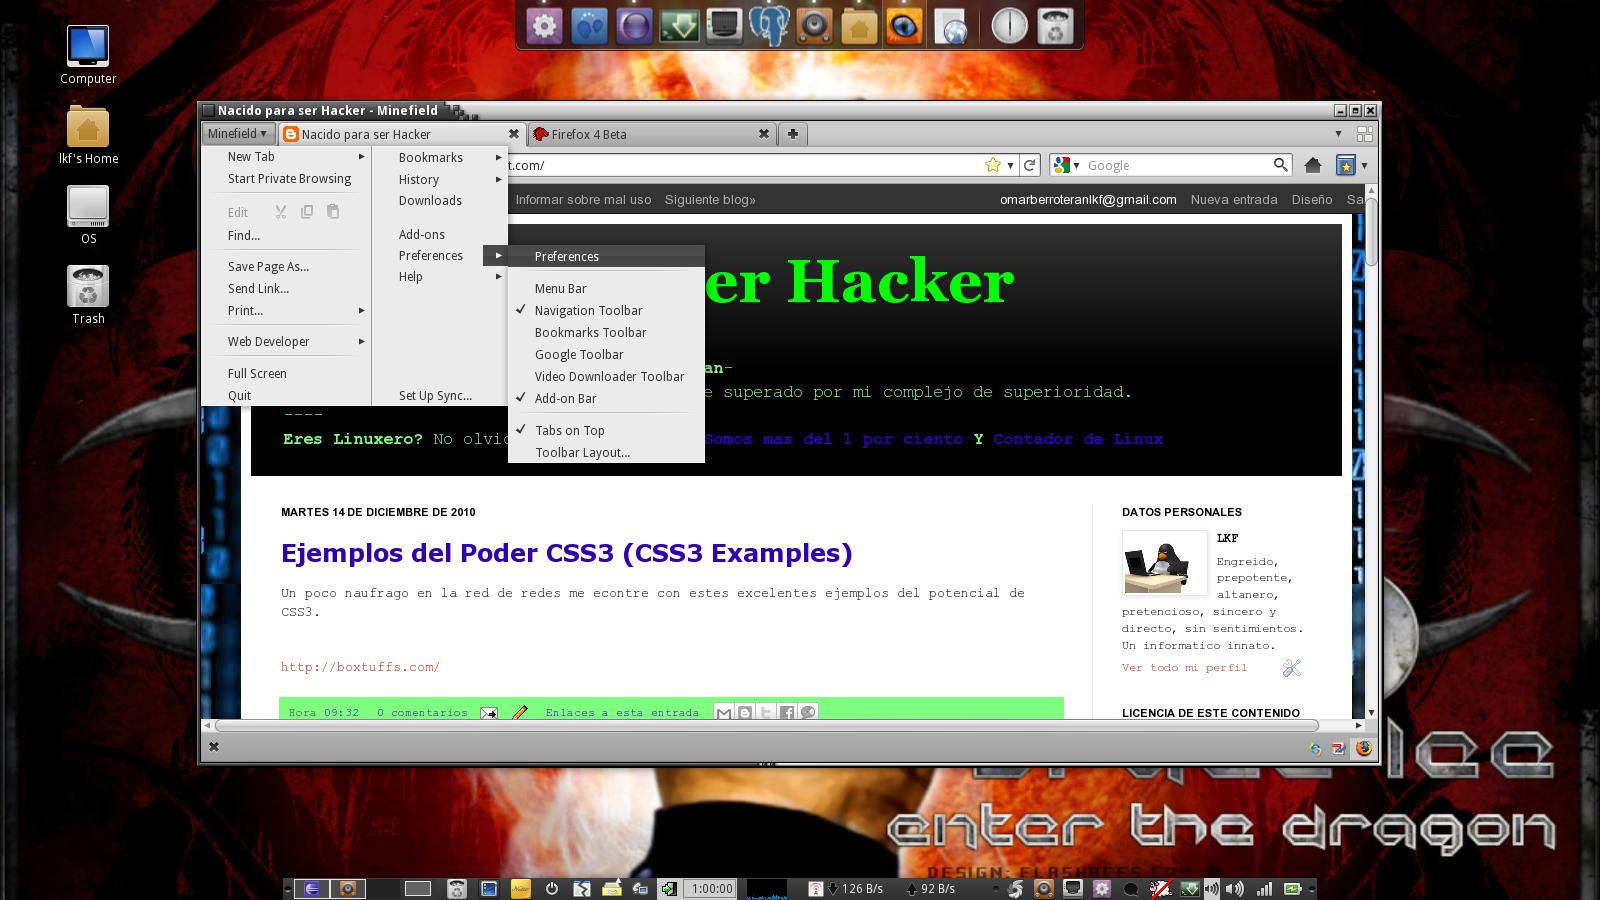 Nacido para ser Informatico: get Firefox 4 (Mozilla Firefox 4)